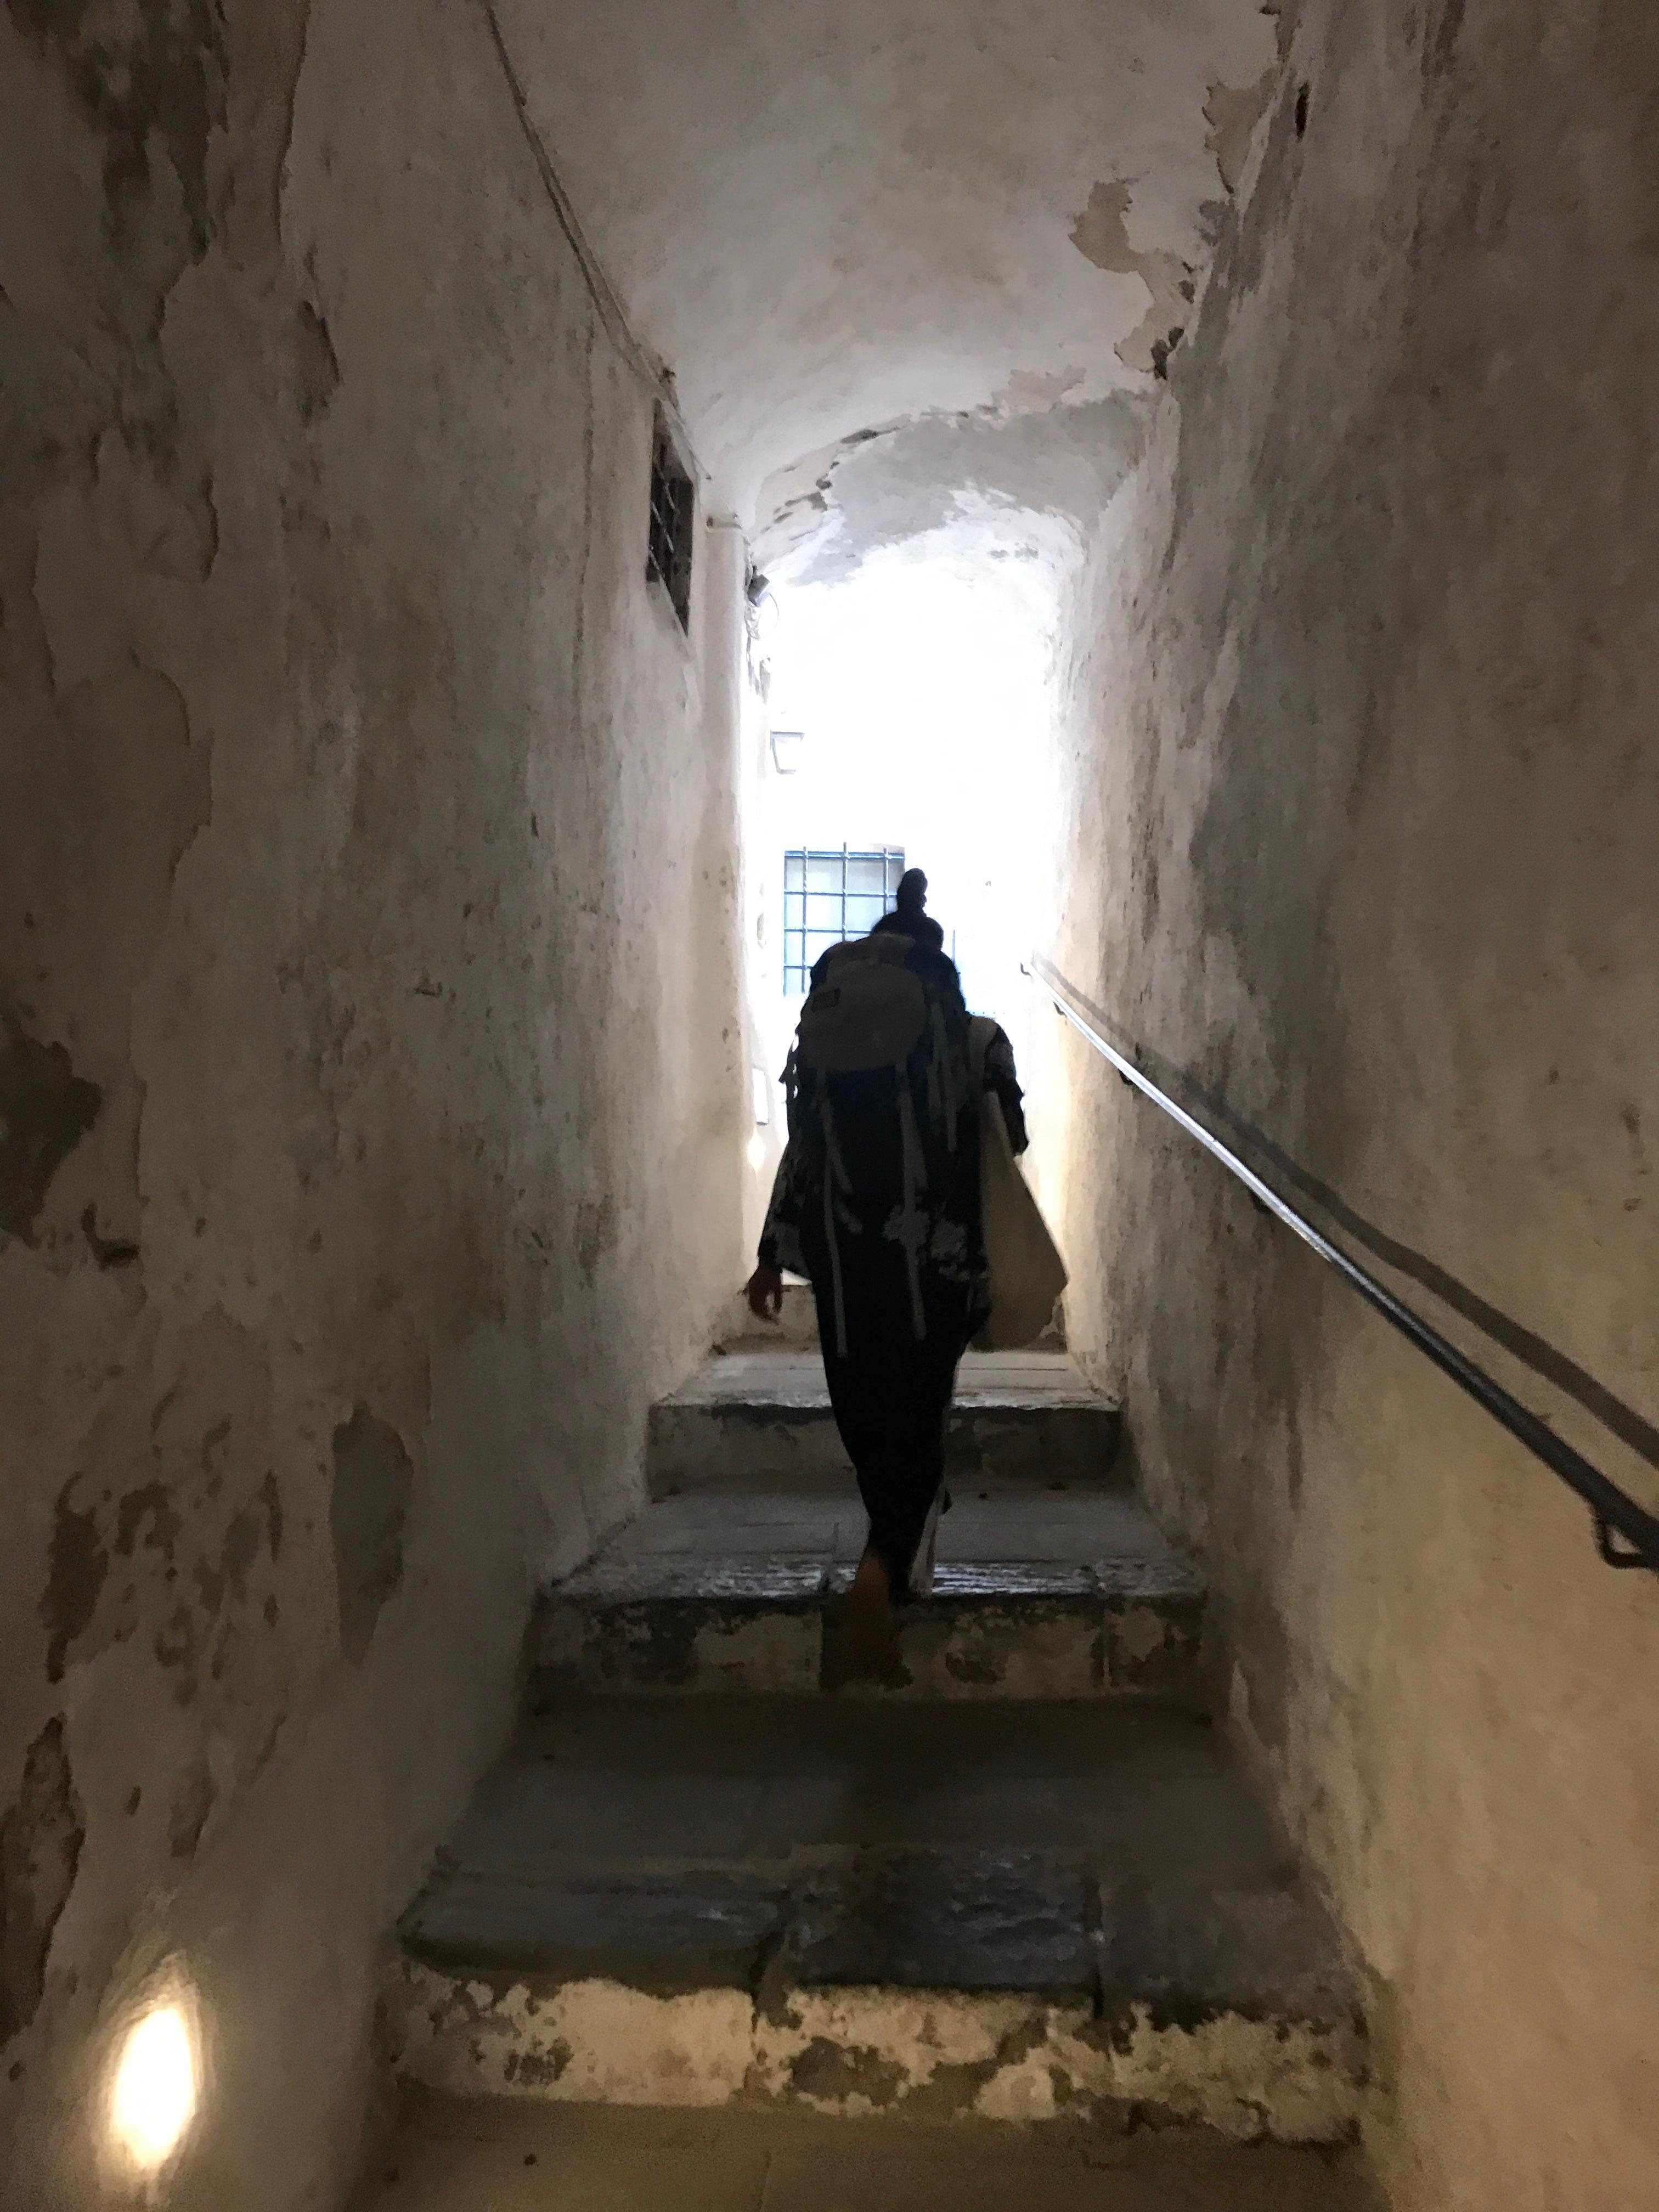 Walkway up to hotel